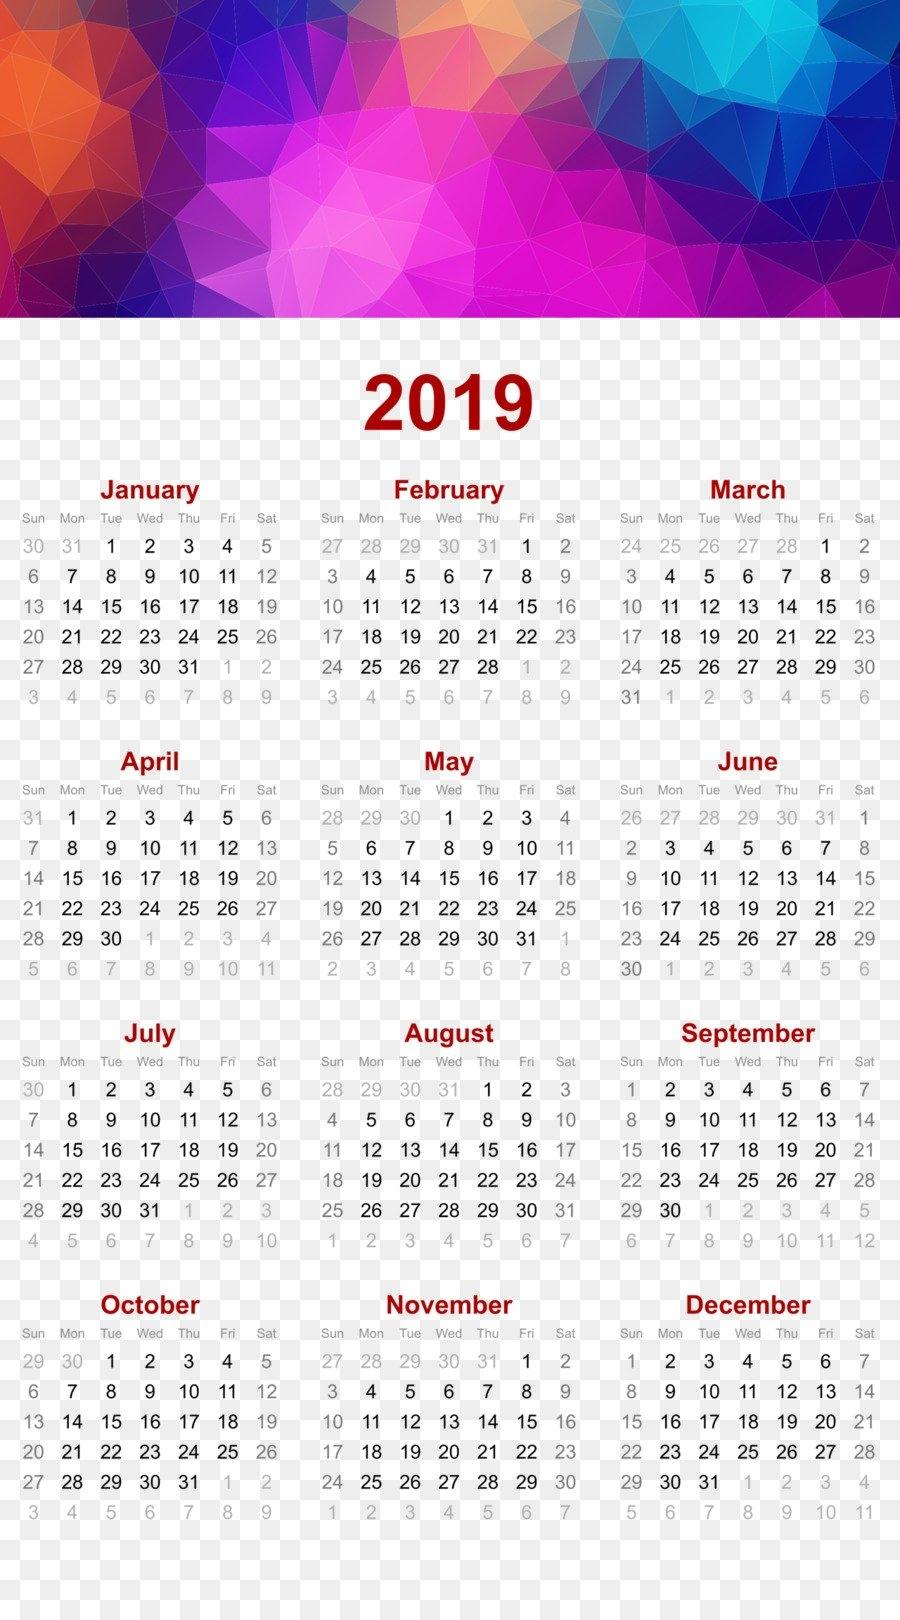 2019 Printable Calendar - Triangles Polygon Geomet - Others Png Calendar 2019 Vishu